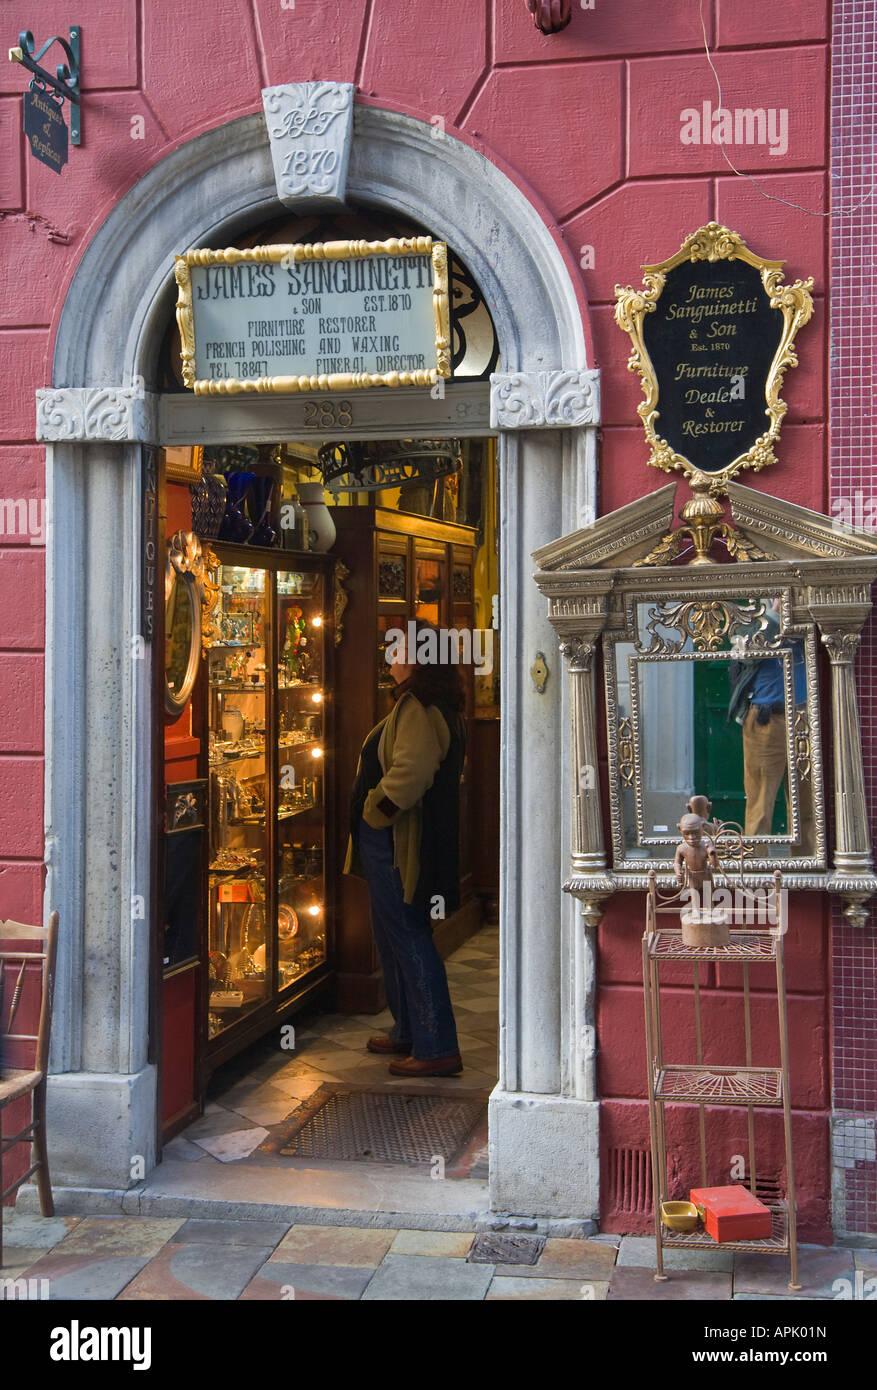 Gibraltar Georgian Front Of Main Street Antique Shop James Sanguinetti And  Son Furniture Dealer And Restorer